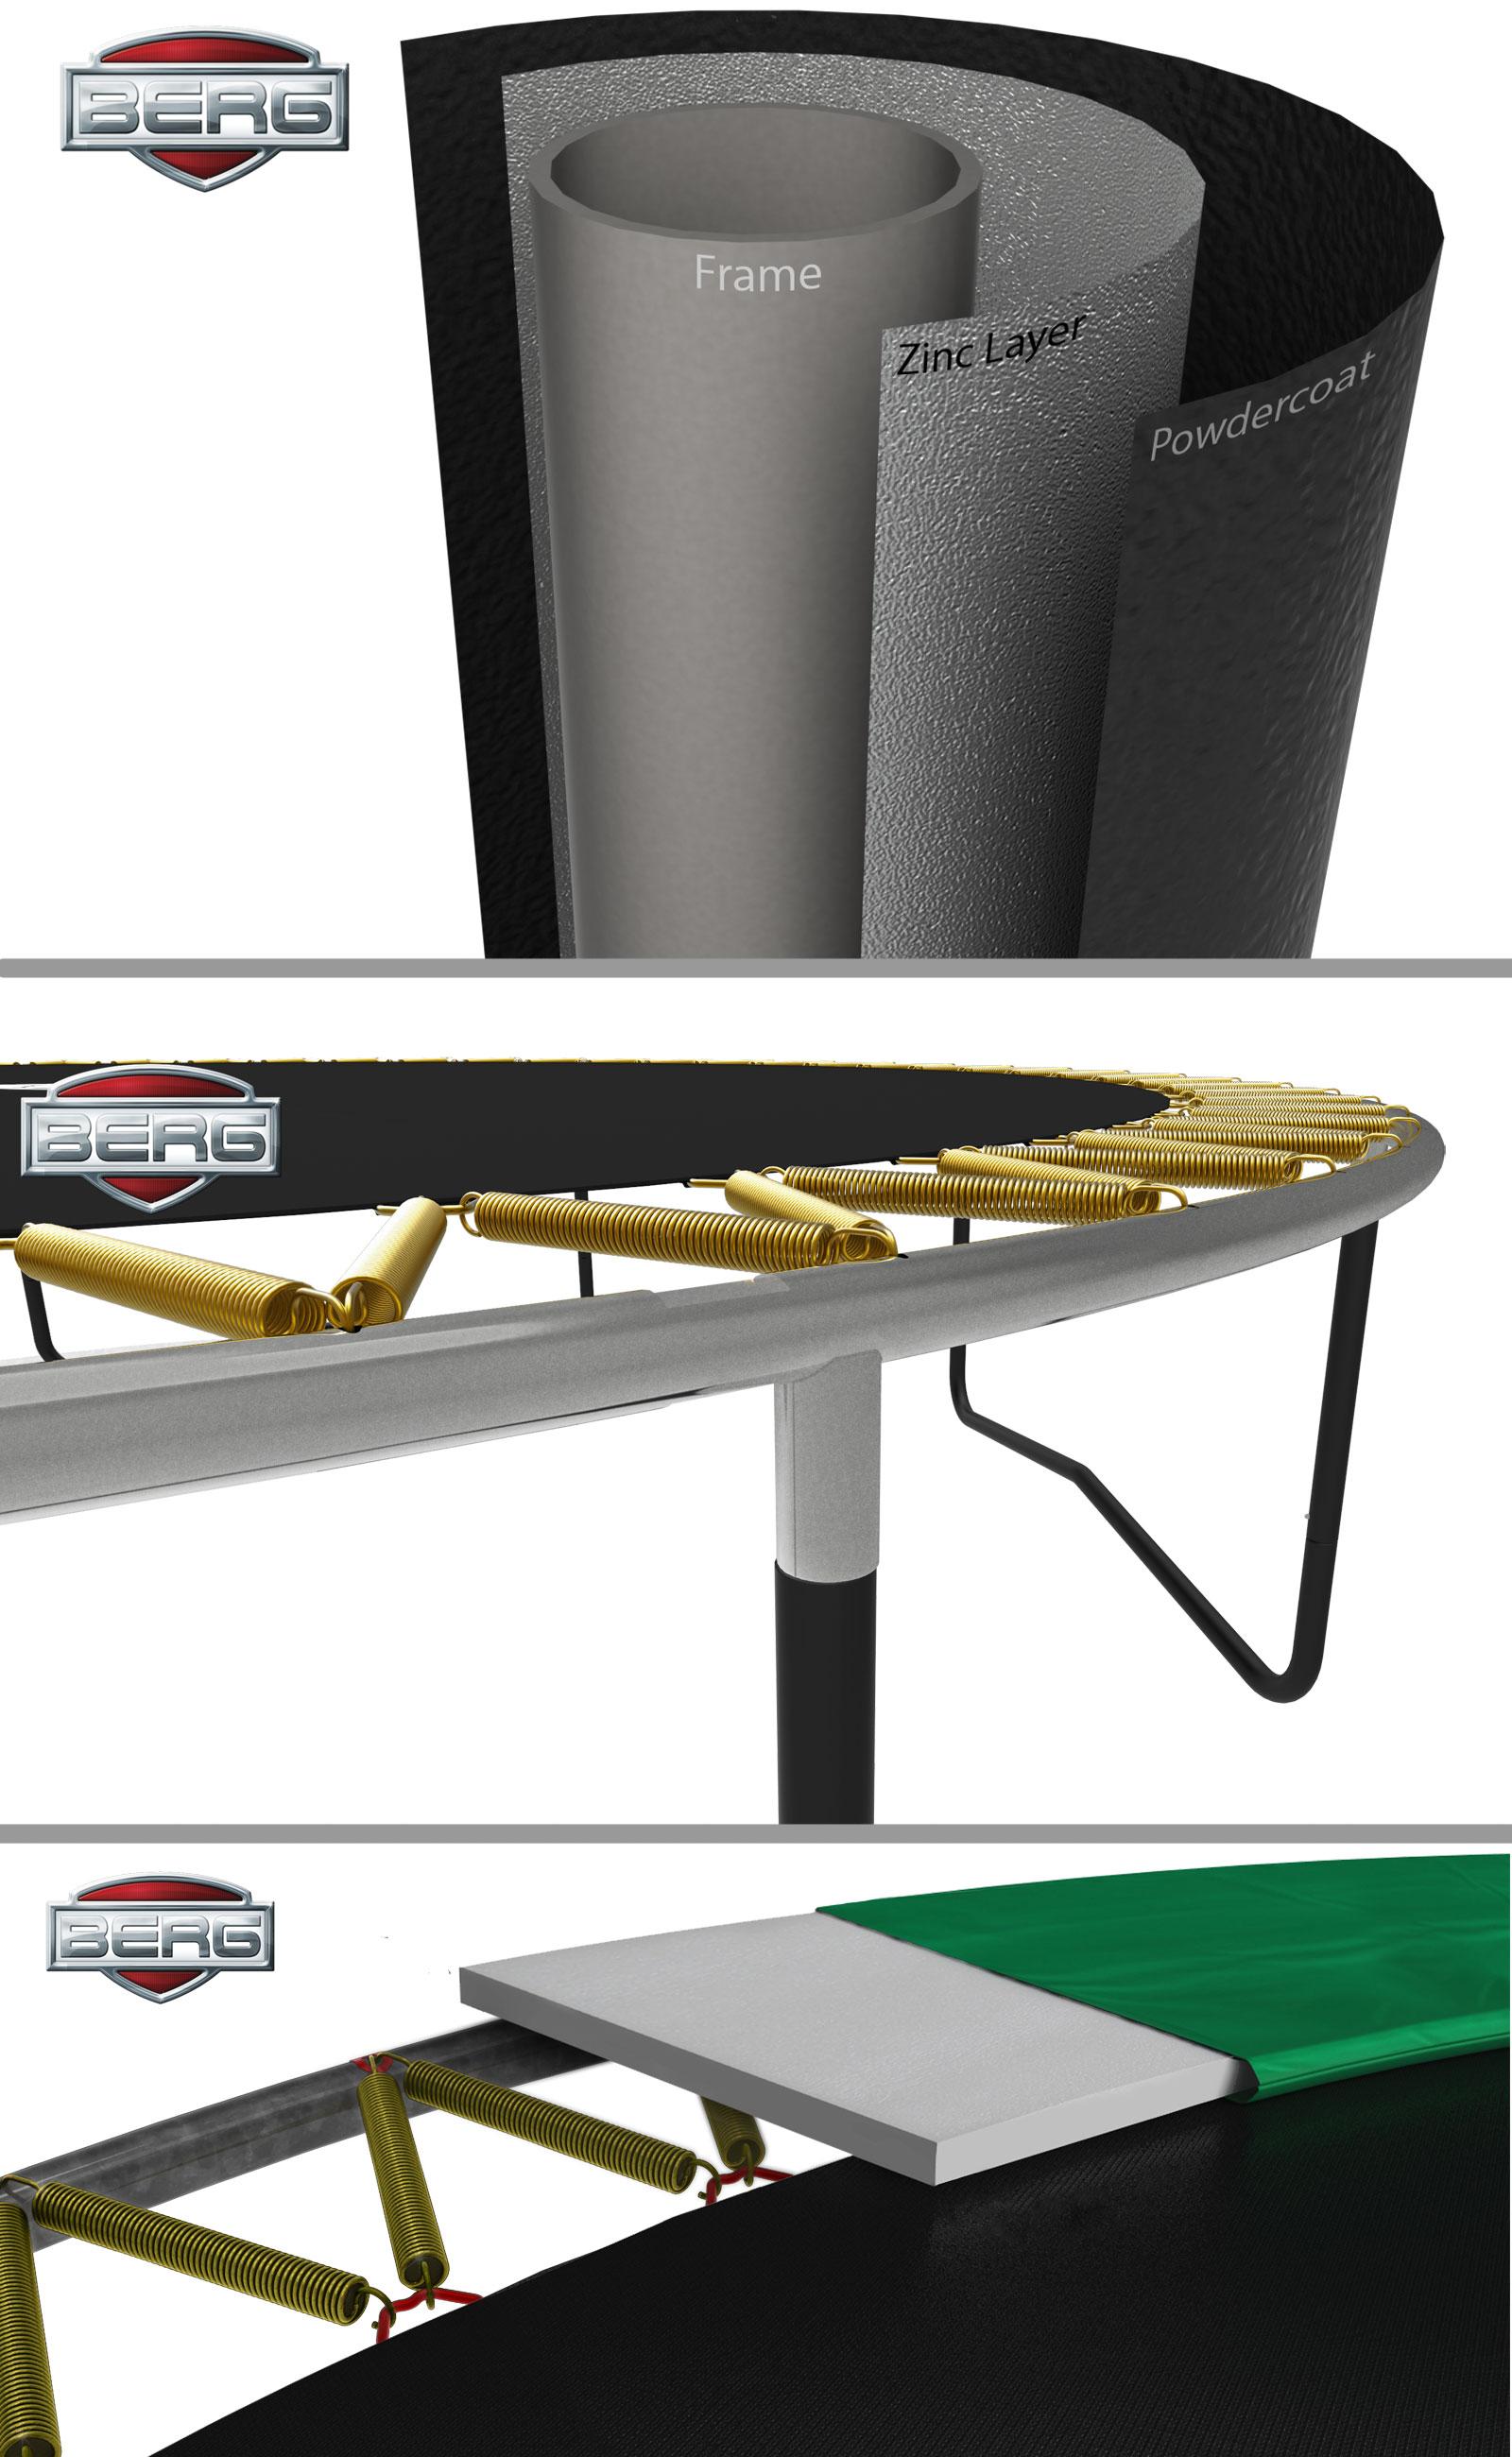 Trampolin InGround Champion EazyFit grau Netz Deluxe 330x220 BERG toys Bild 3